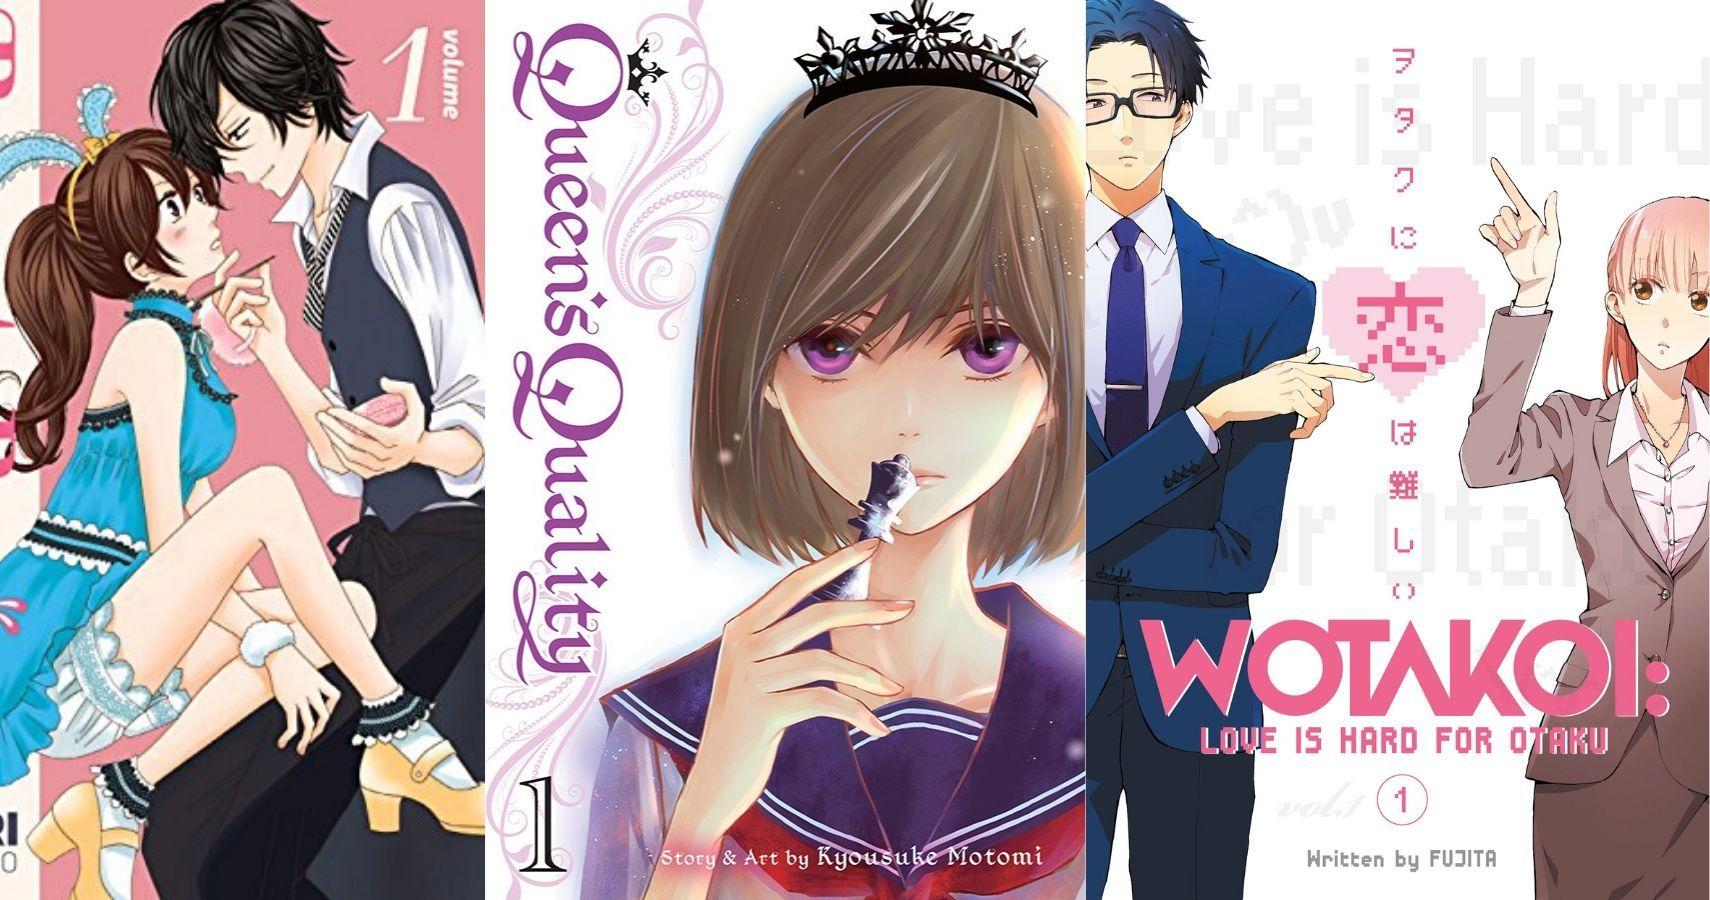 The 10 Greatest Josei Manga Of The Decade According To Goodreads